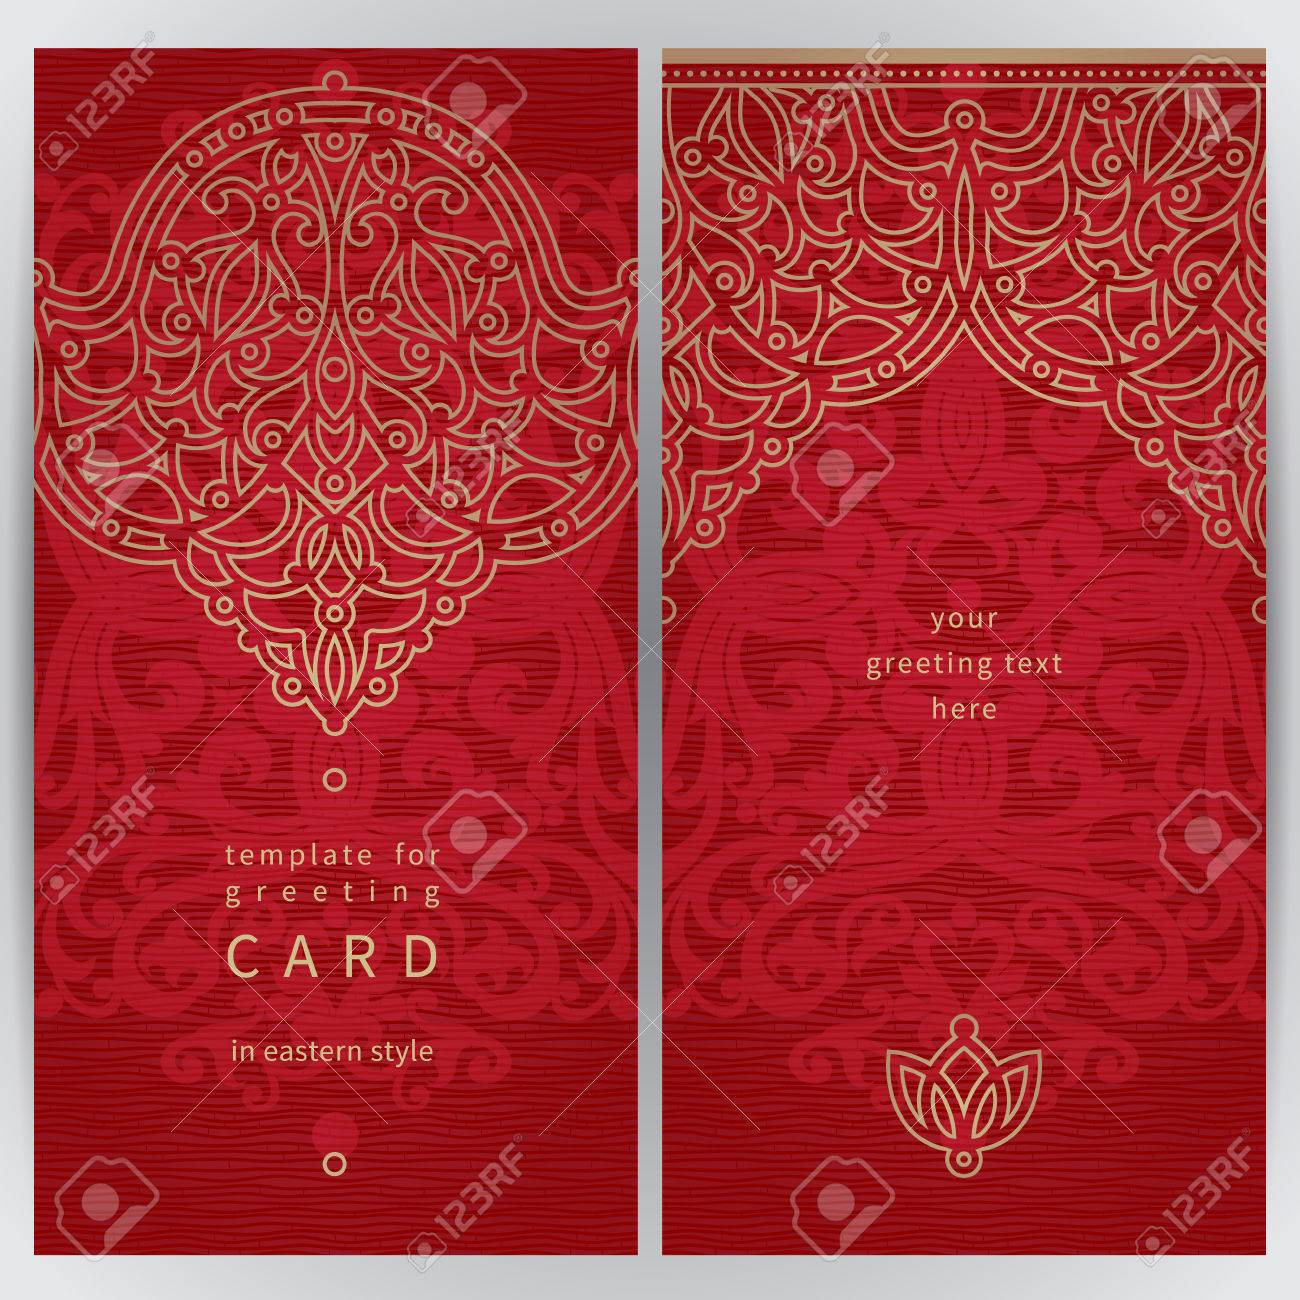 Vintage Ornate Cards In Oriental Style. Golden Eastern Floral ...